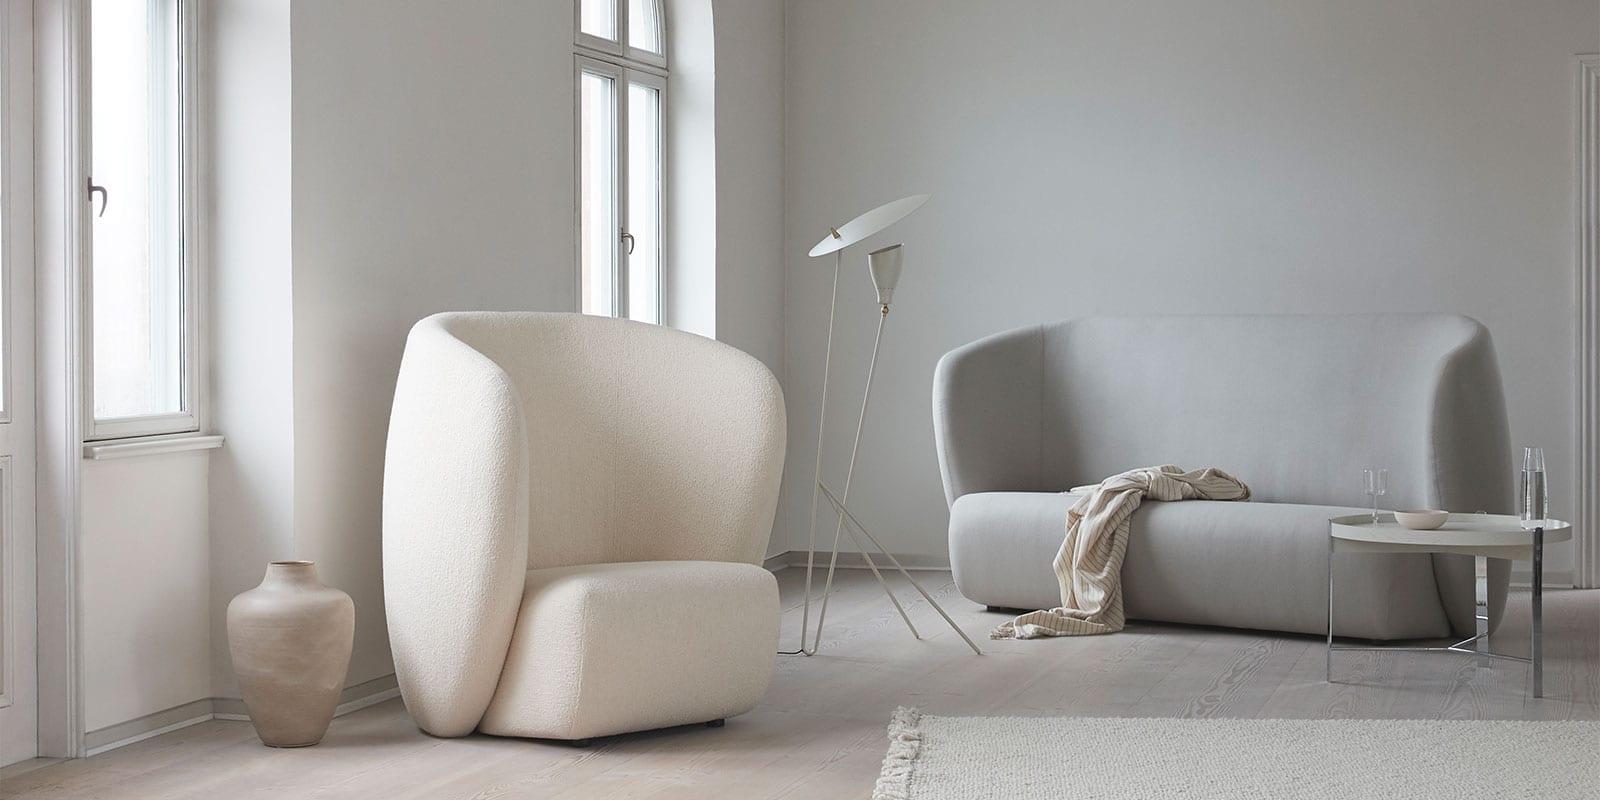 скандинавская мебель nordicdesign.store